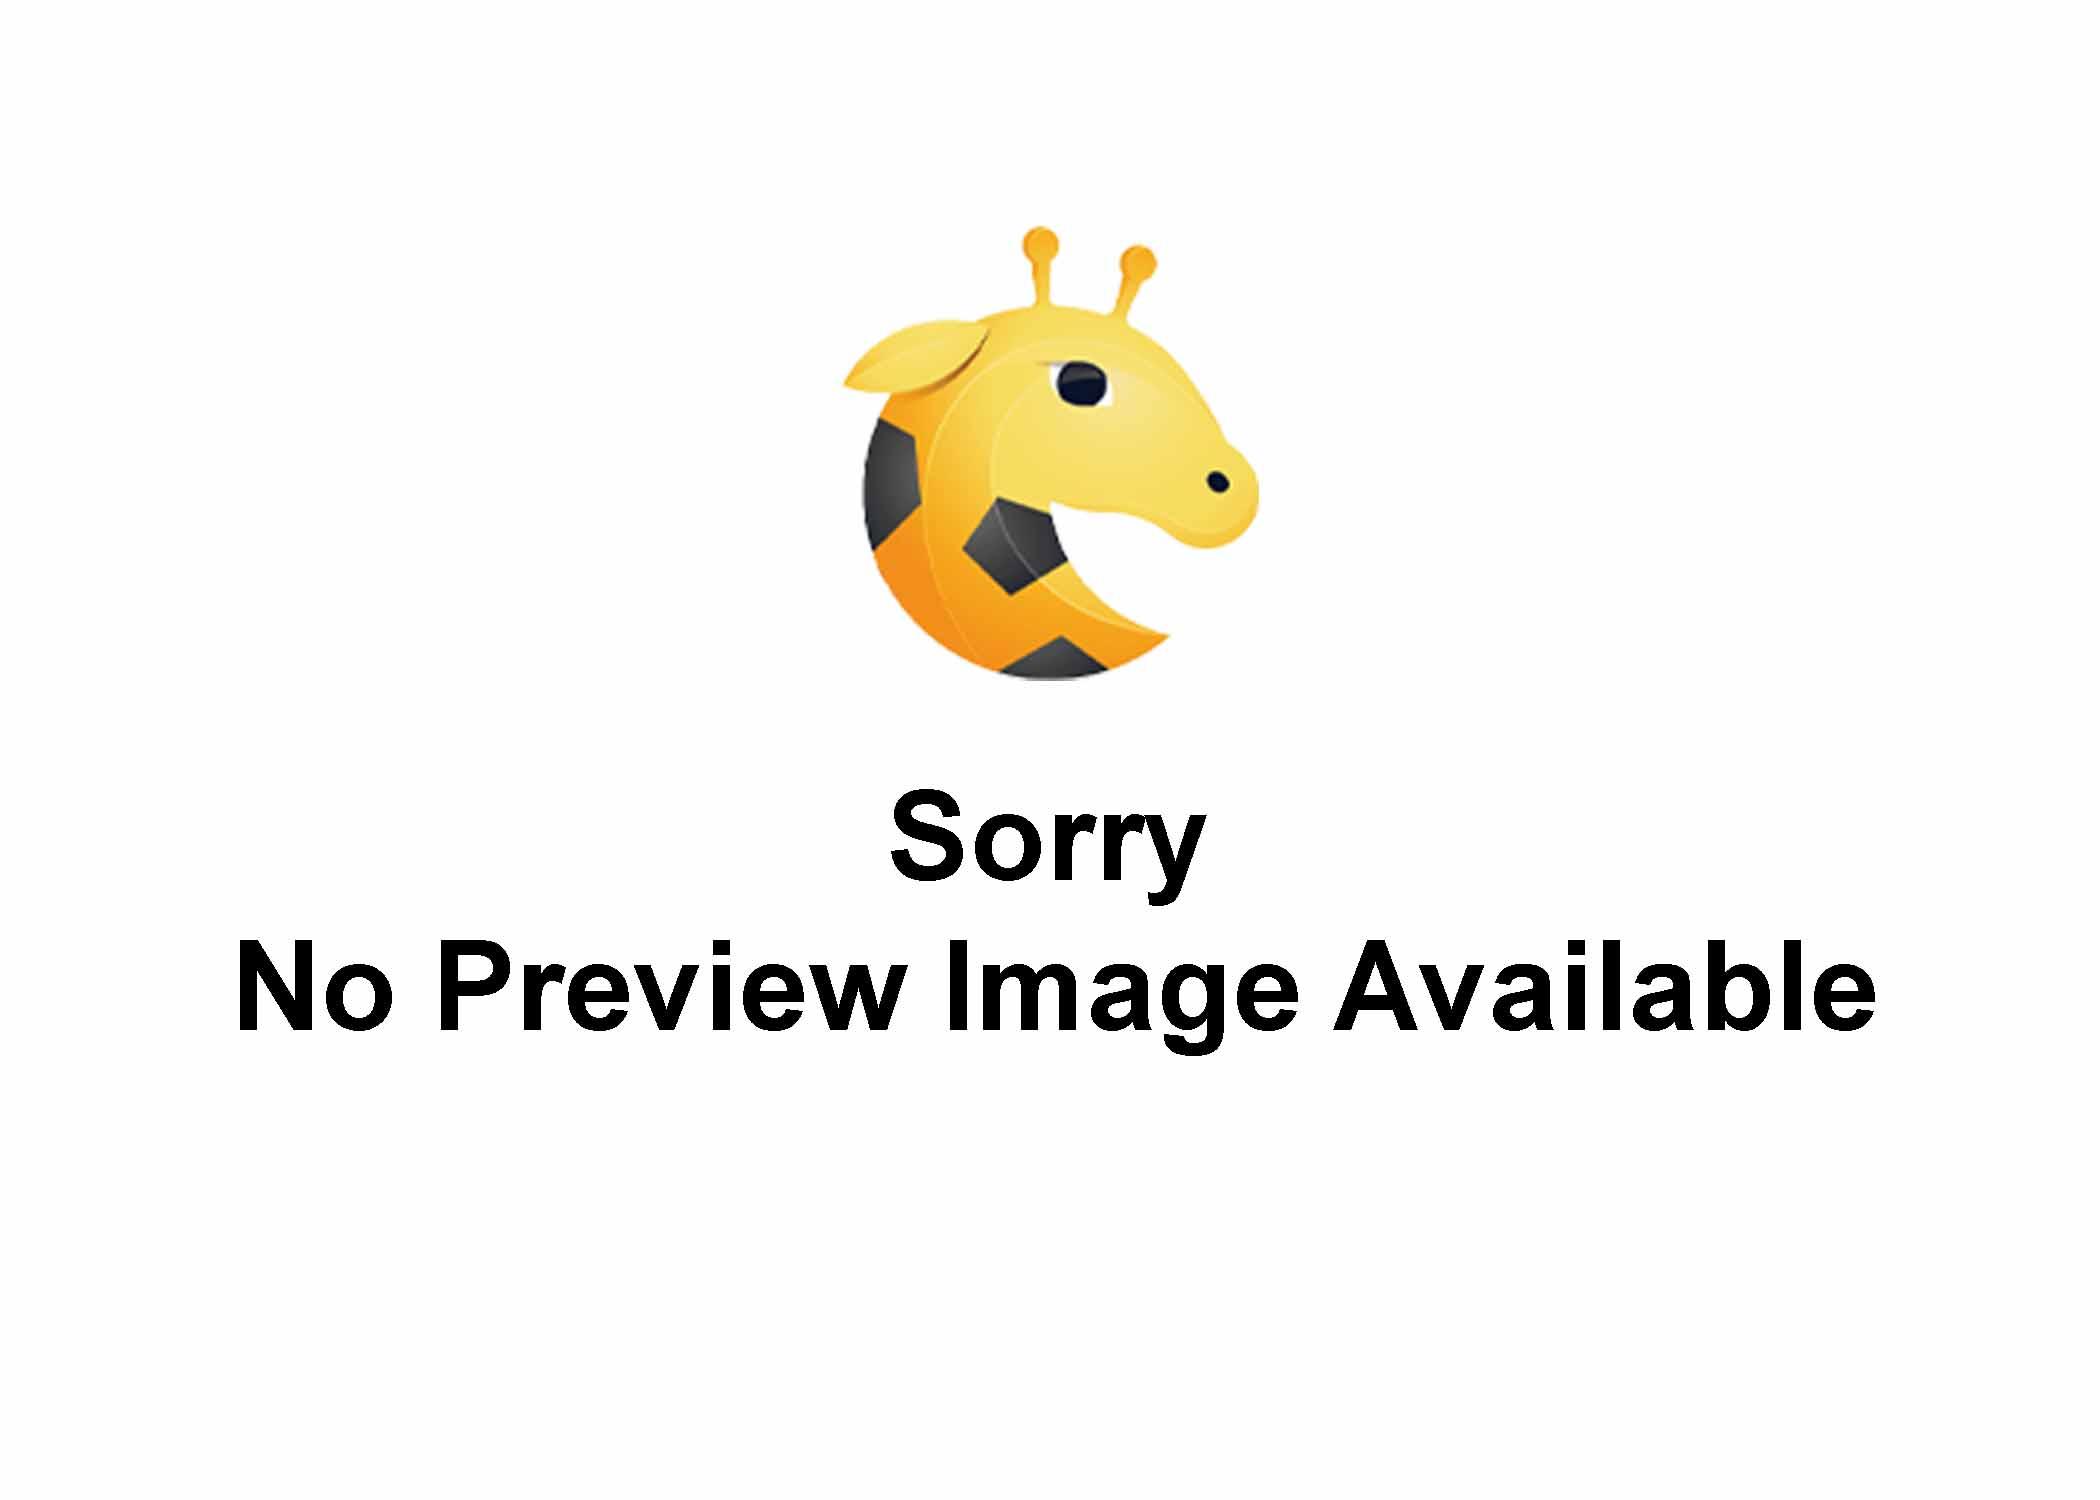 No Preview Available Free Download Picgiraffe.com